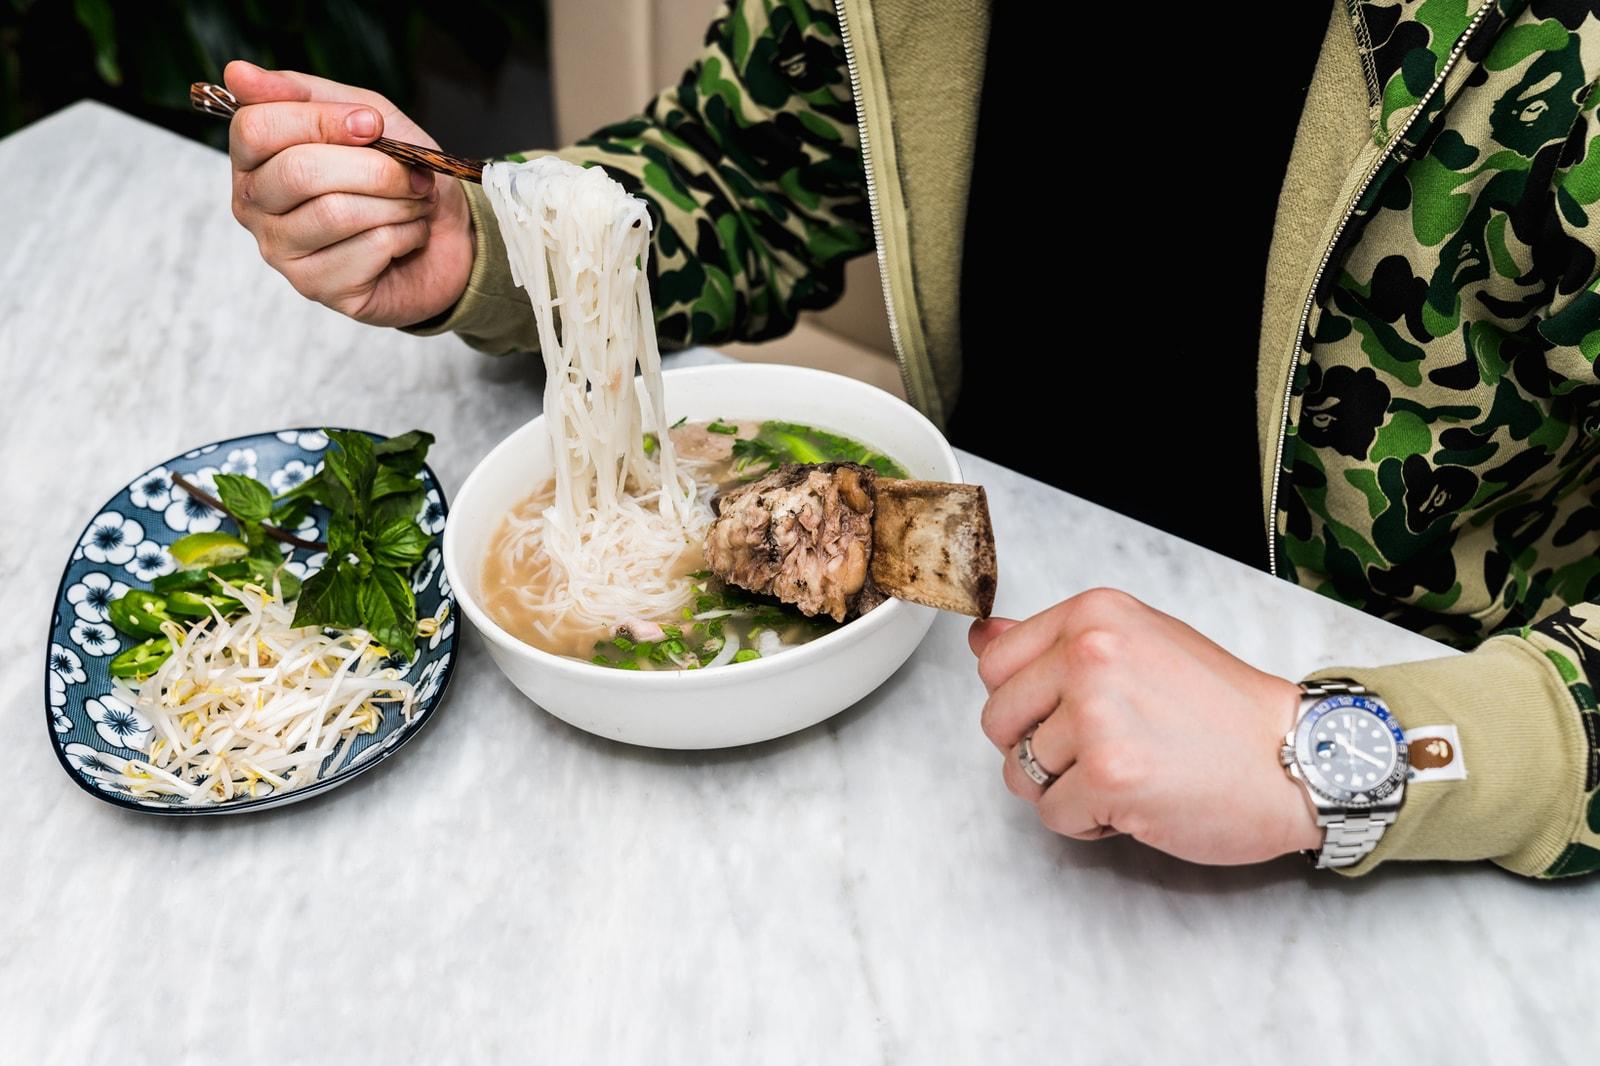 Jimmy Ly Madame Vo Chef Vietnamese Food BAPE Supreme Louis Vuitton New York City Medicom Bearbrick KAWS Companion Air Jordan 11 DMP